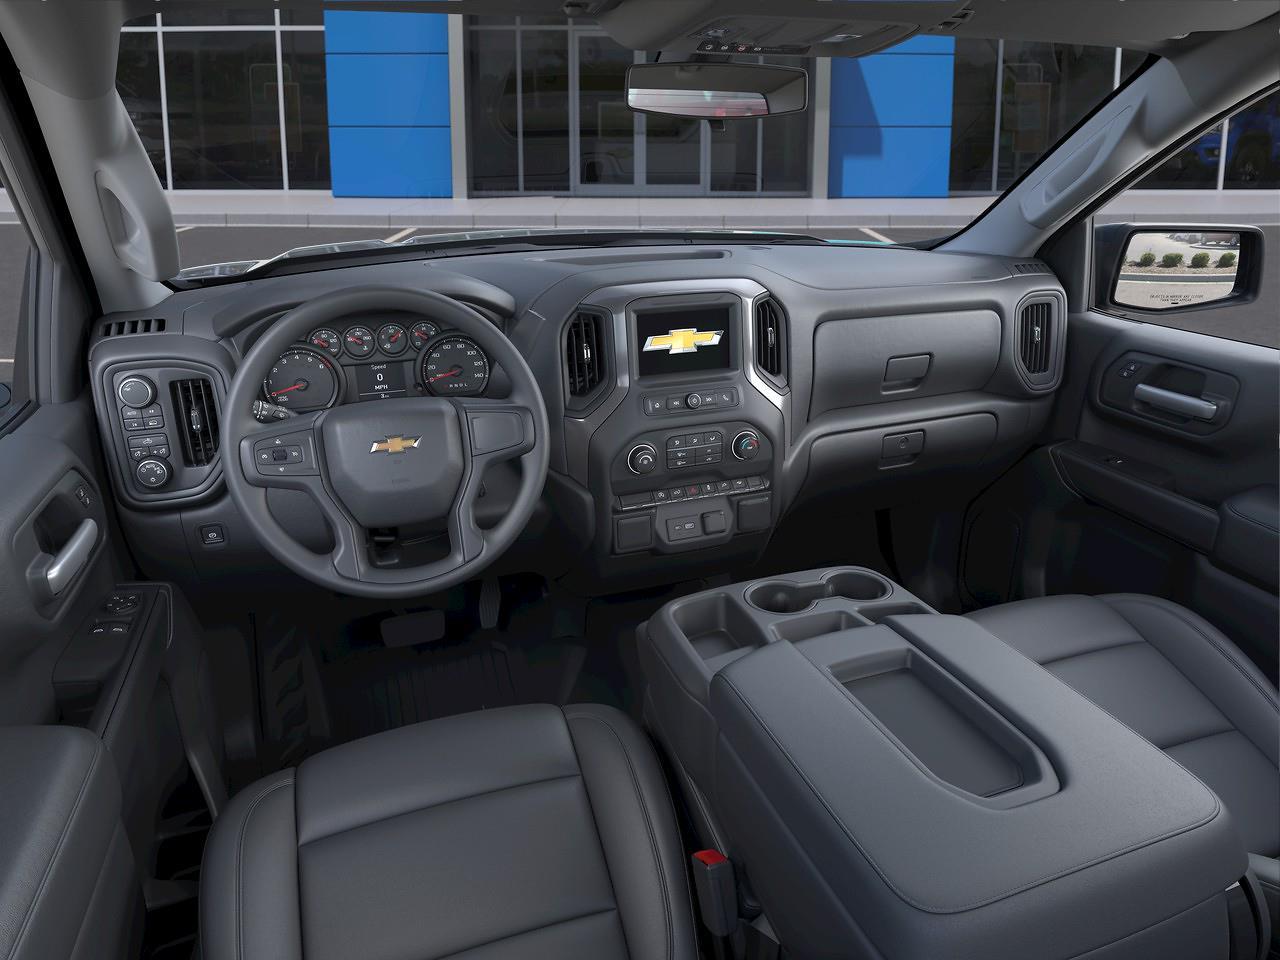 2021 Chevrolet Silverado 1500 Regular Cab 4x4, Pickup #Q210393 - photo 32